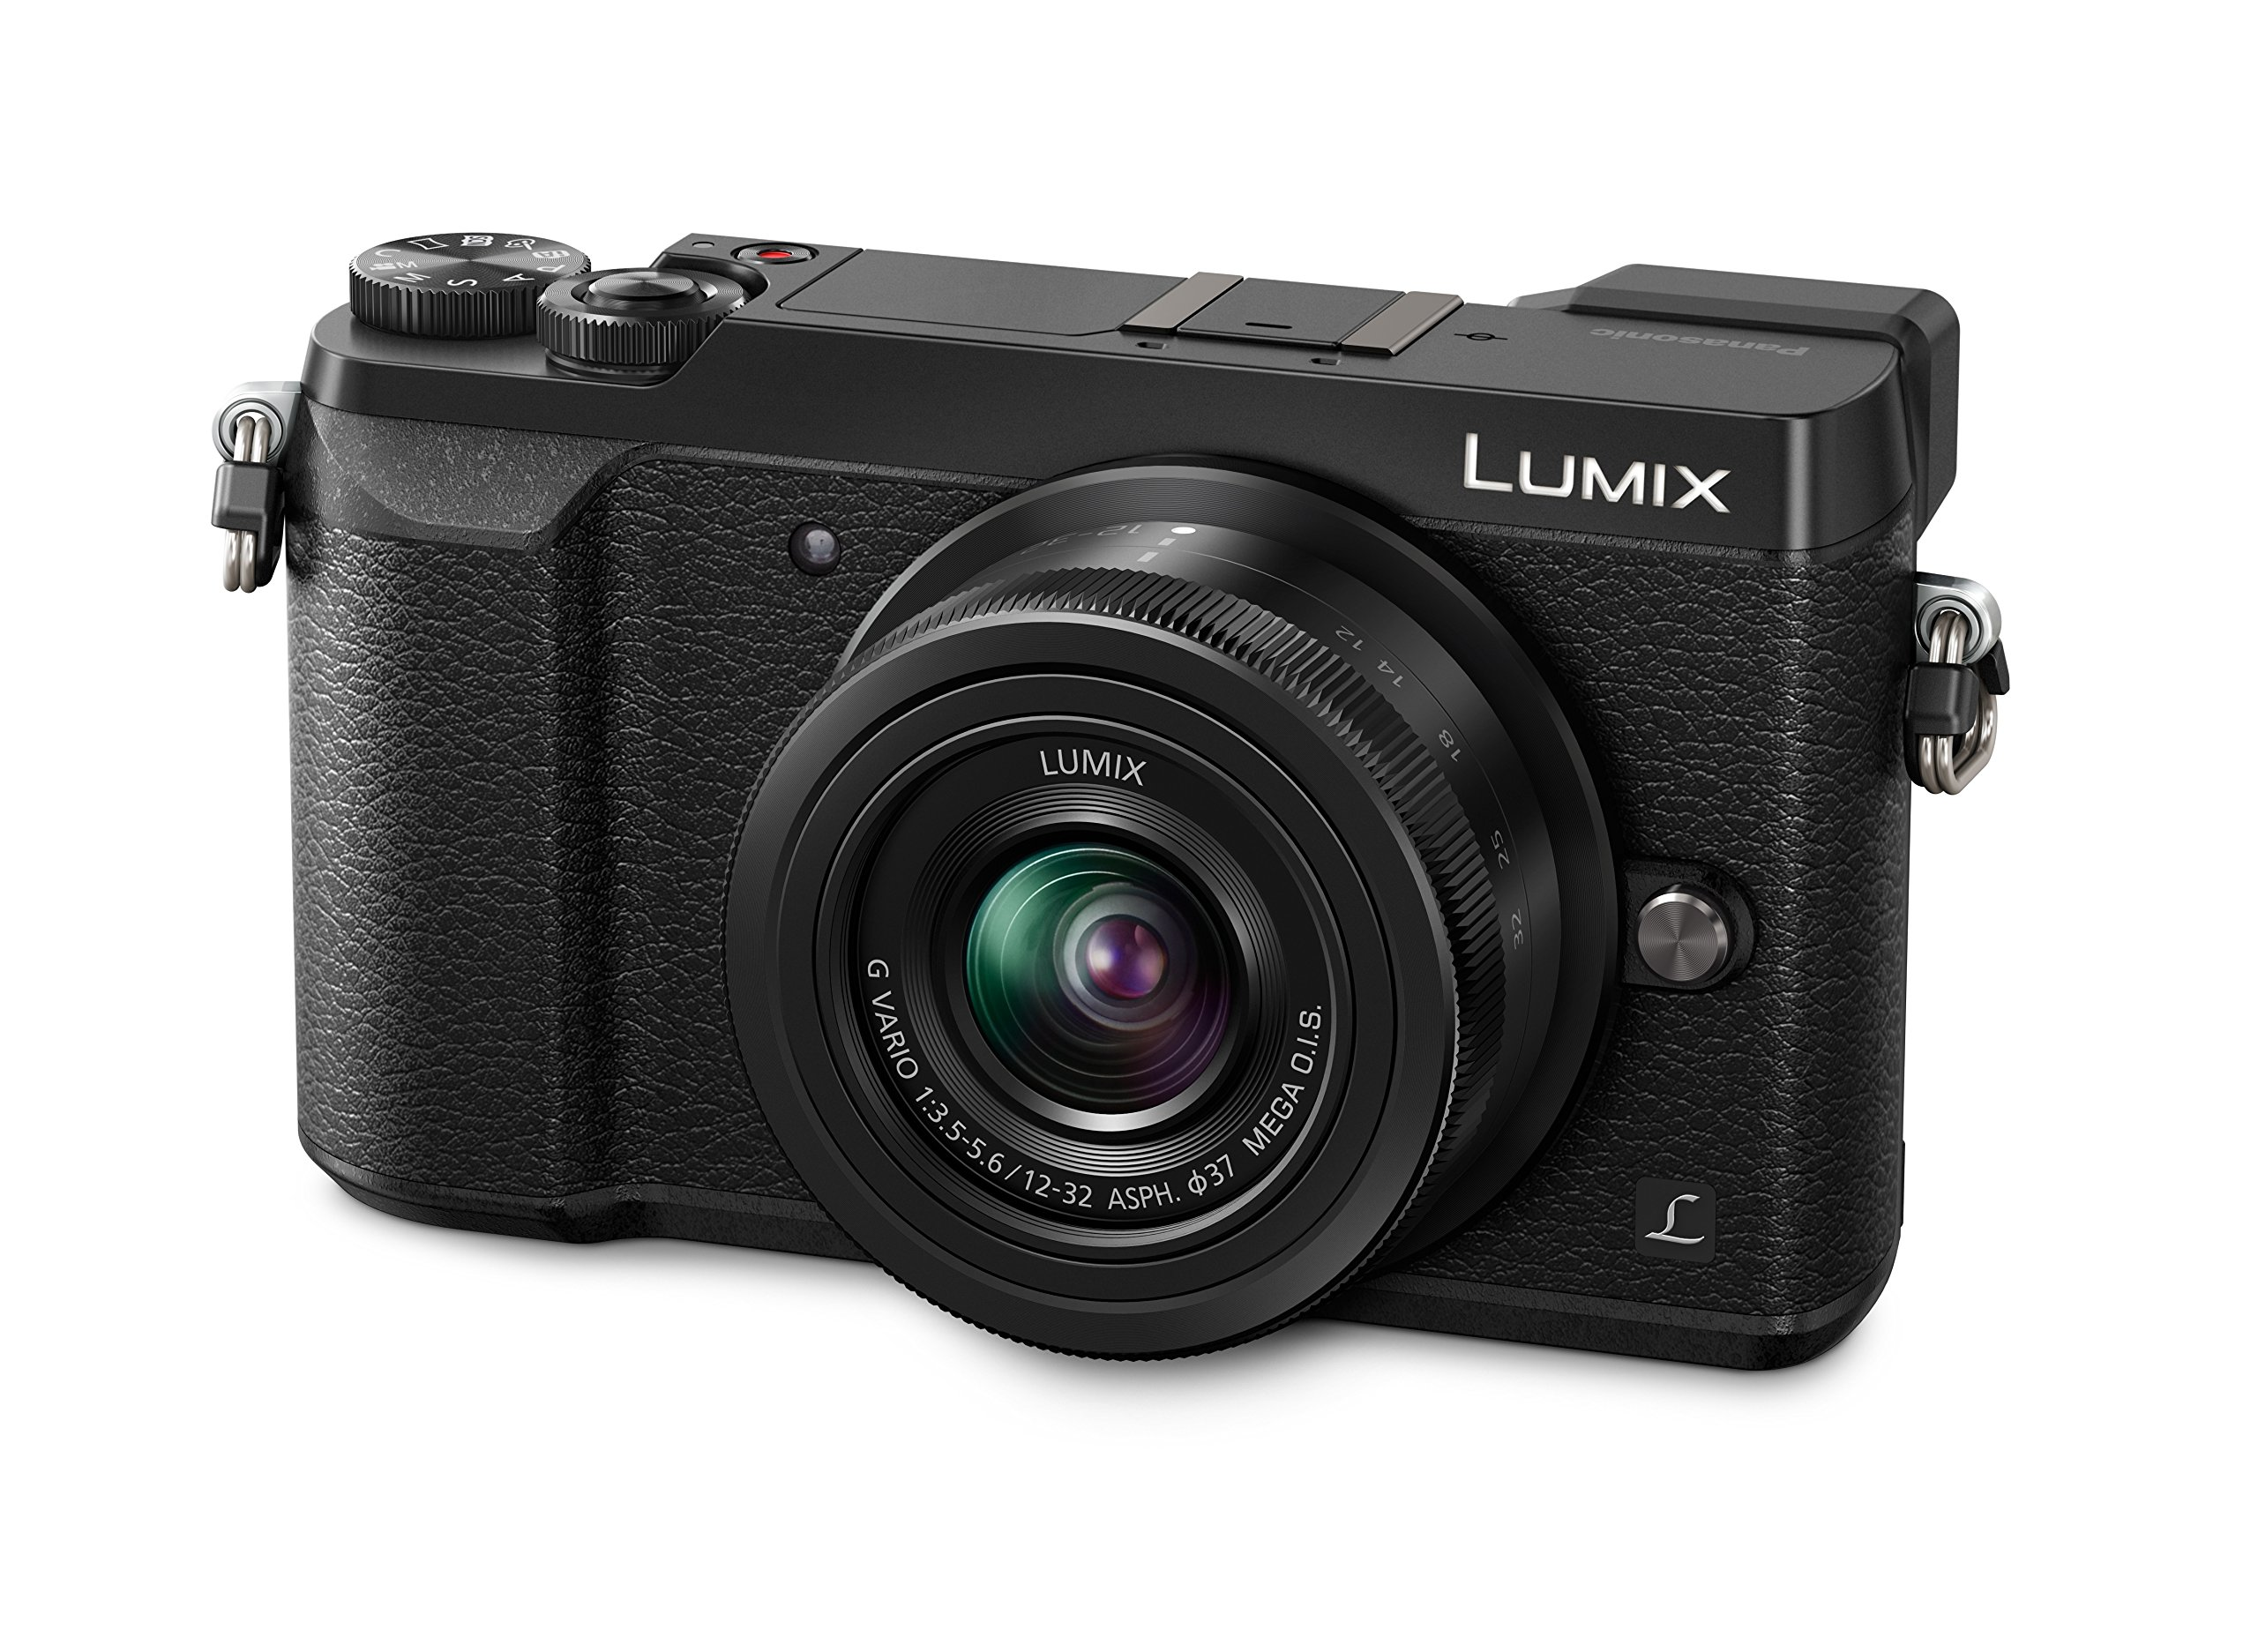 Panasonic Lumix DMC-GX80KEGK Kit Fotocamera Mirrorless GX80 e Obiettivo 12-32mm, 16 MP, Nero product image